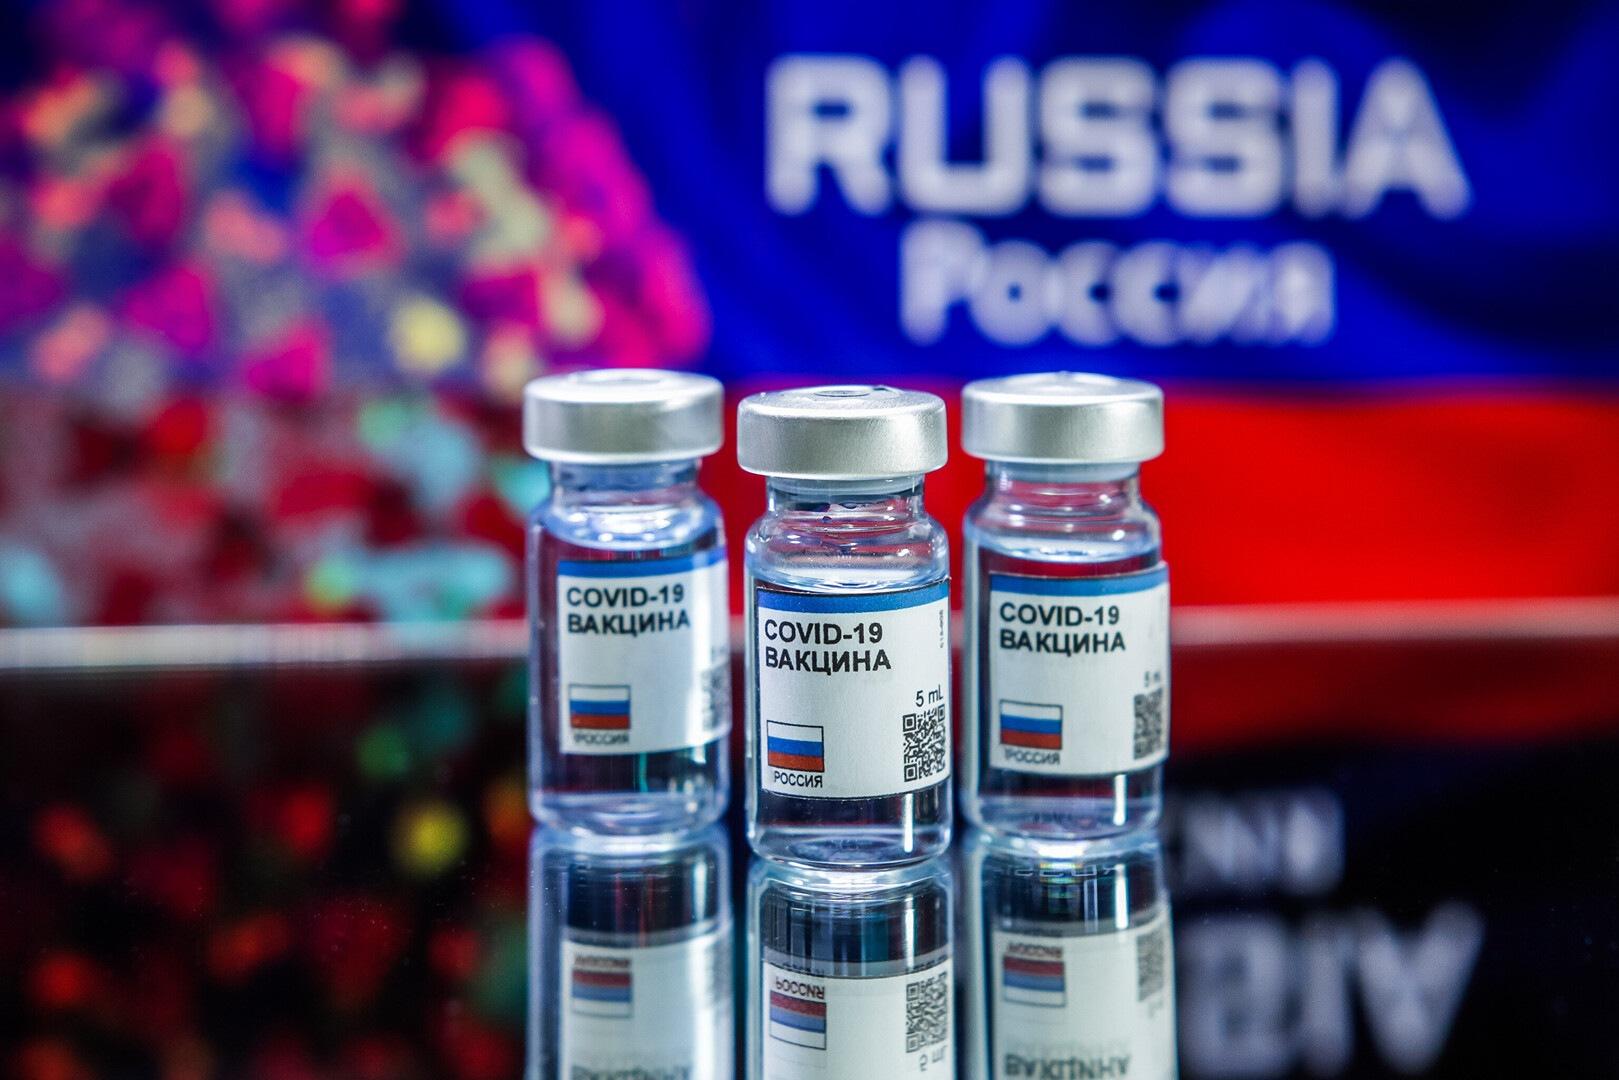 Обзор и новости о вакцине от Коронавируса